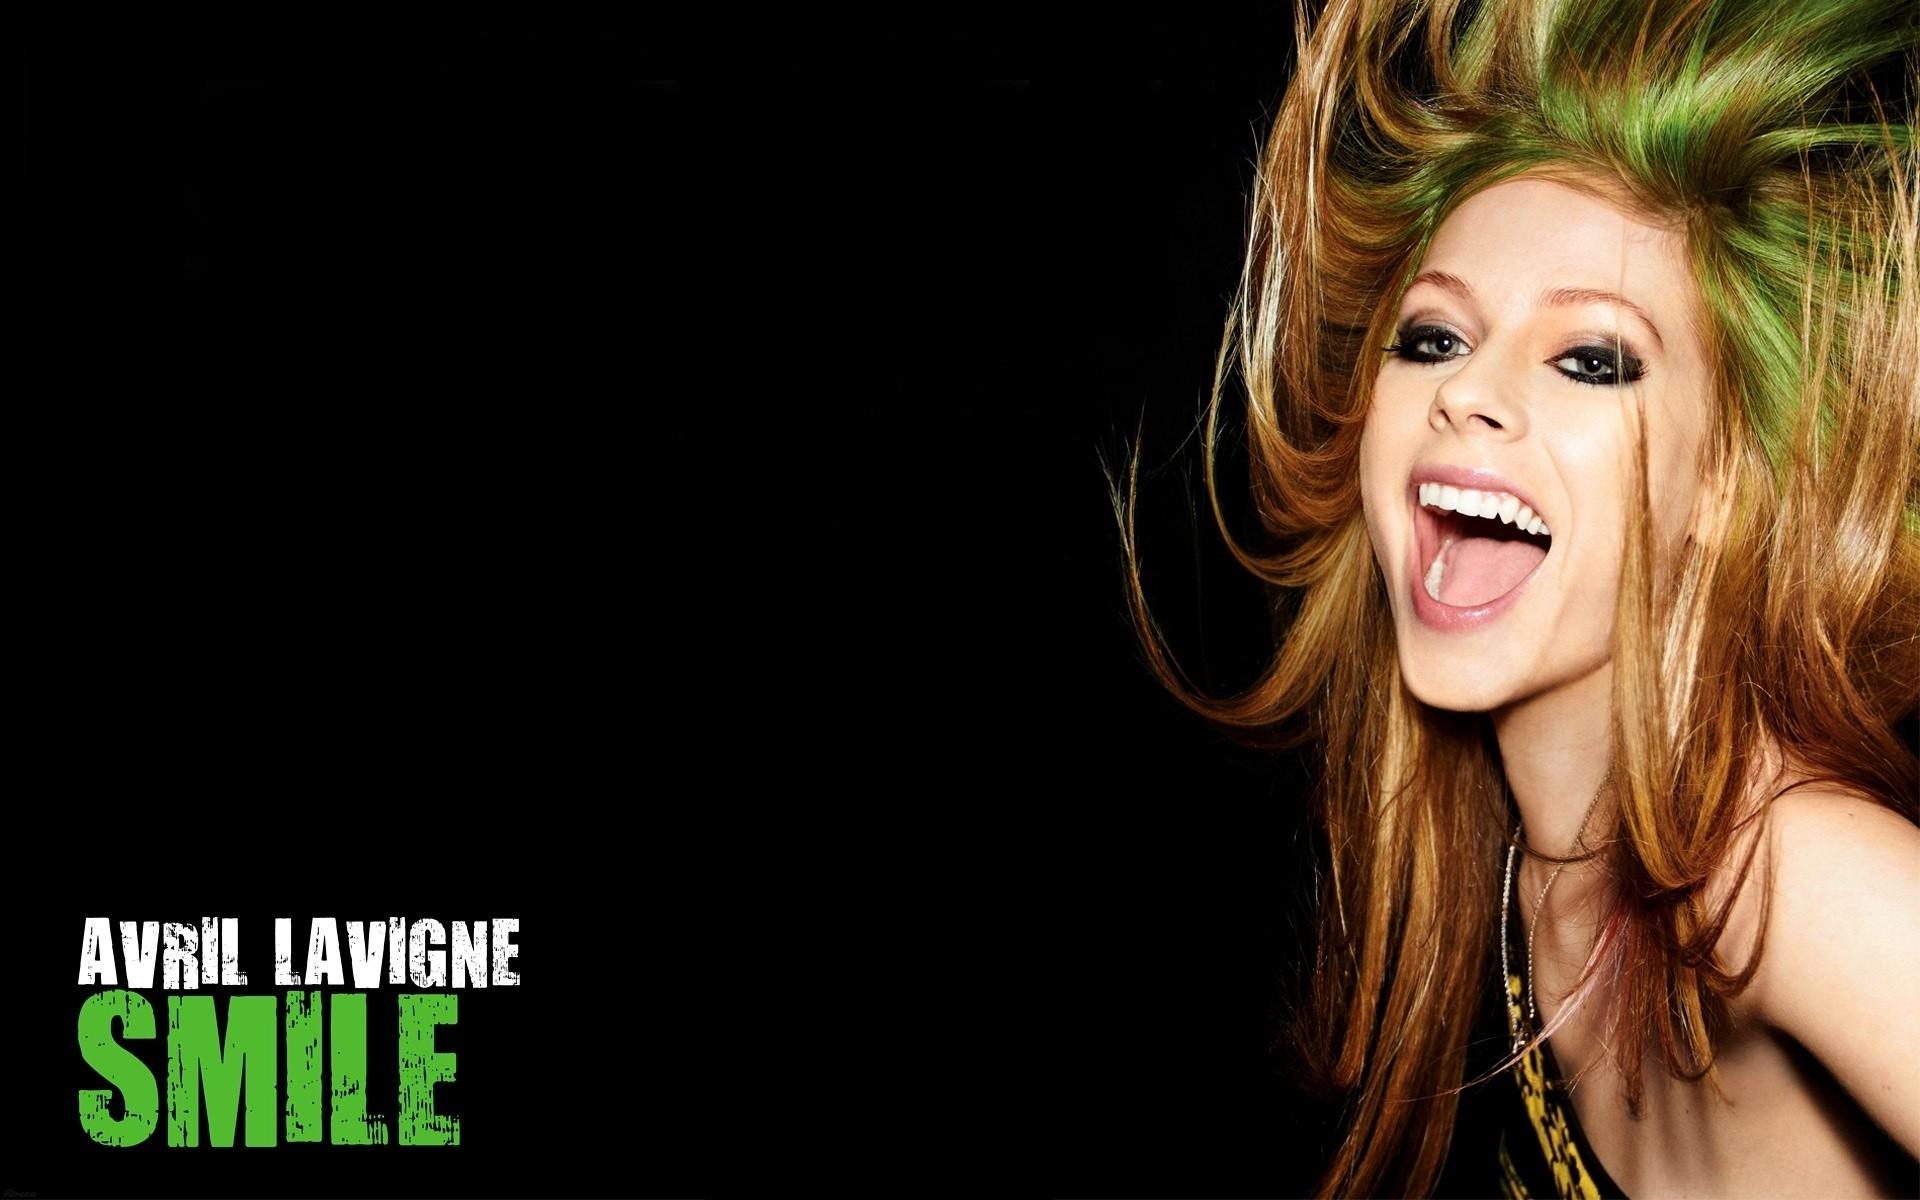 wallpaper : long hair, singer, avril lavigne, microphone, joy, mouth